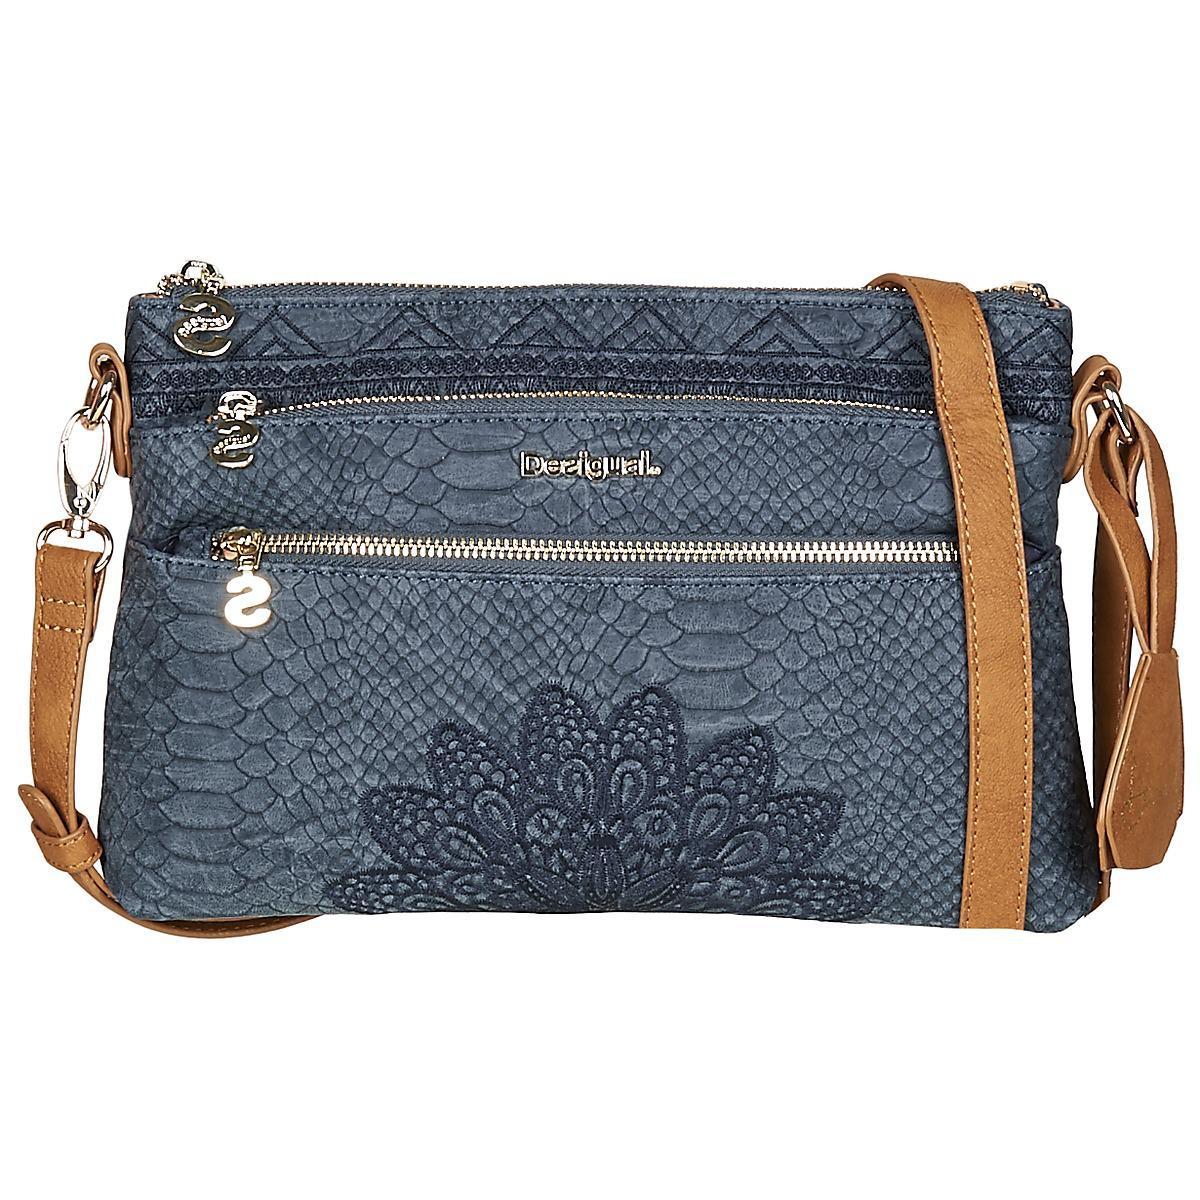 42a423c439531 Desigual Bols Aquiles Durban Women s Shoulder Bag In Blue in Blue ...